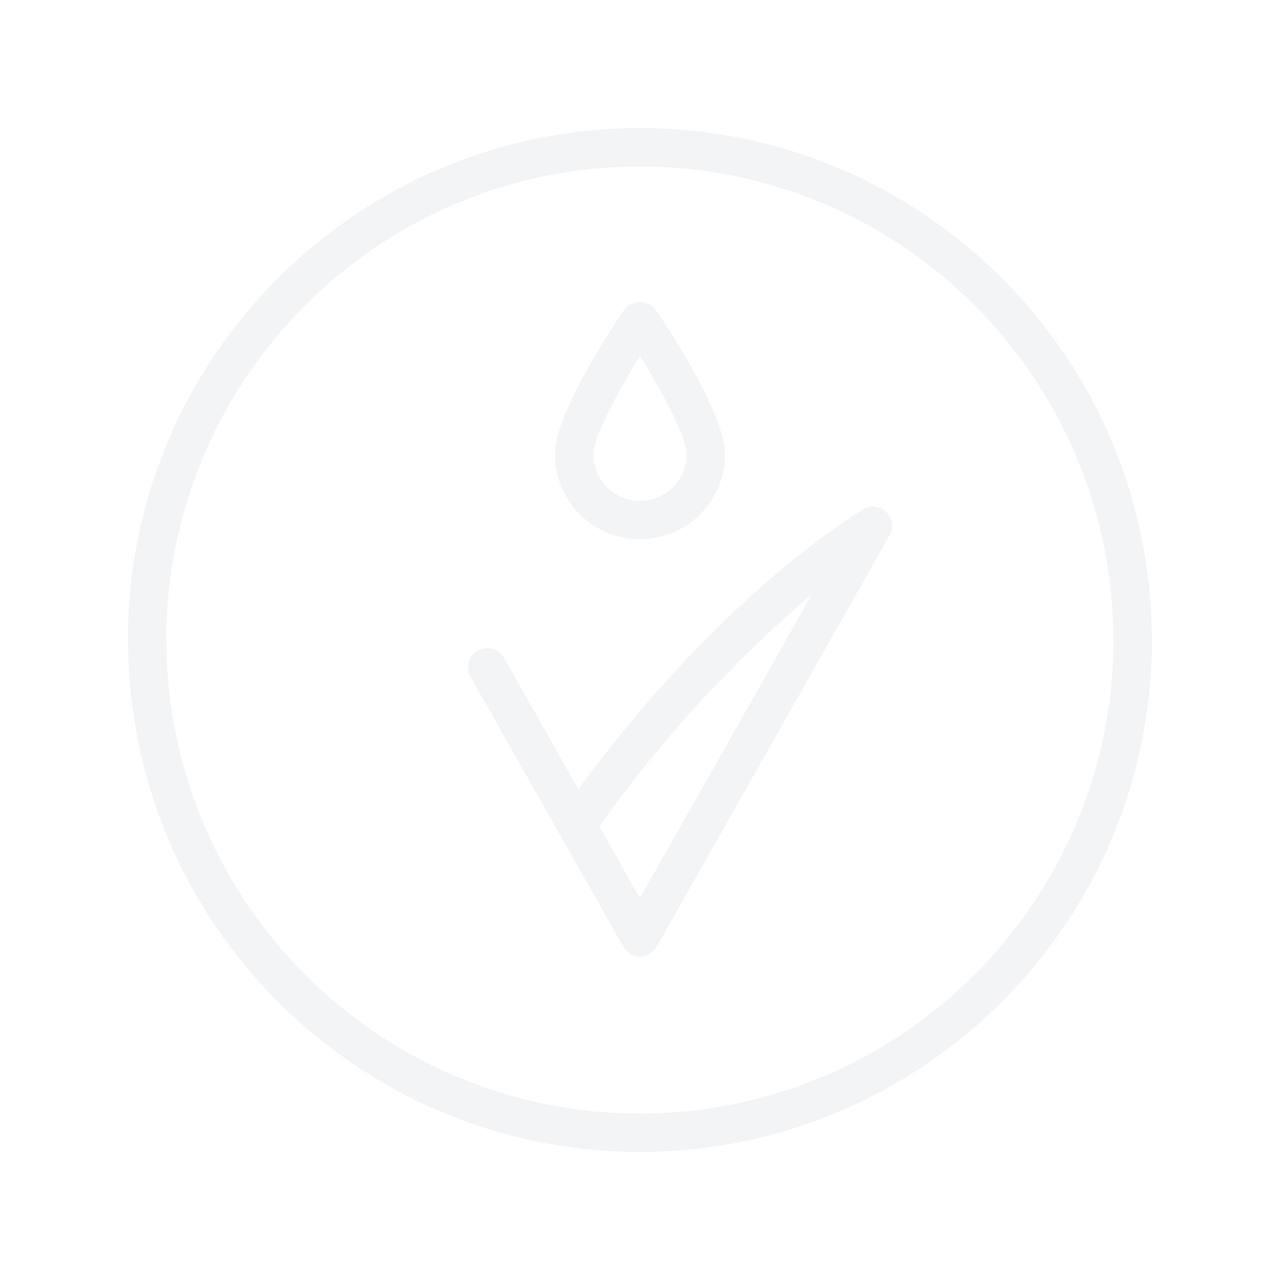 CLARINS Instant Light Lip Comfort Oil No.07 Honey Glam 7ml